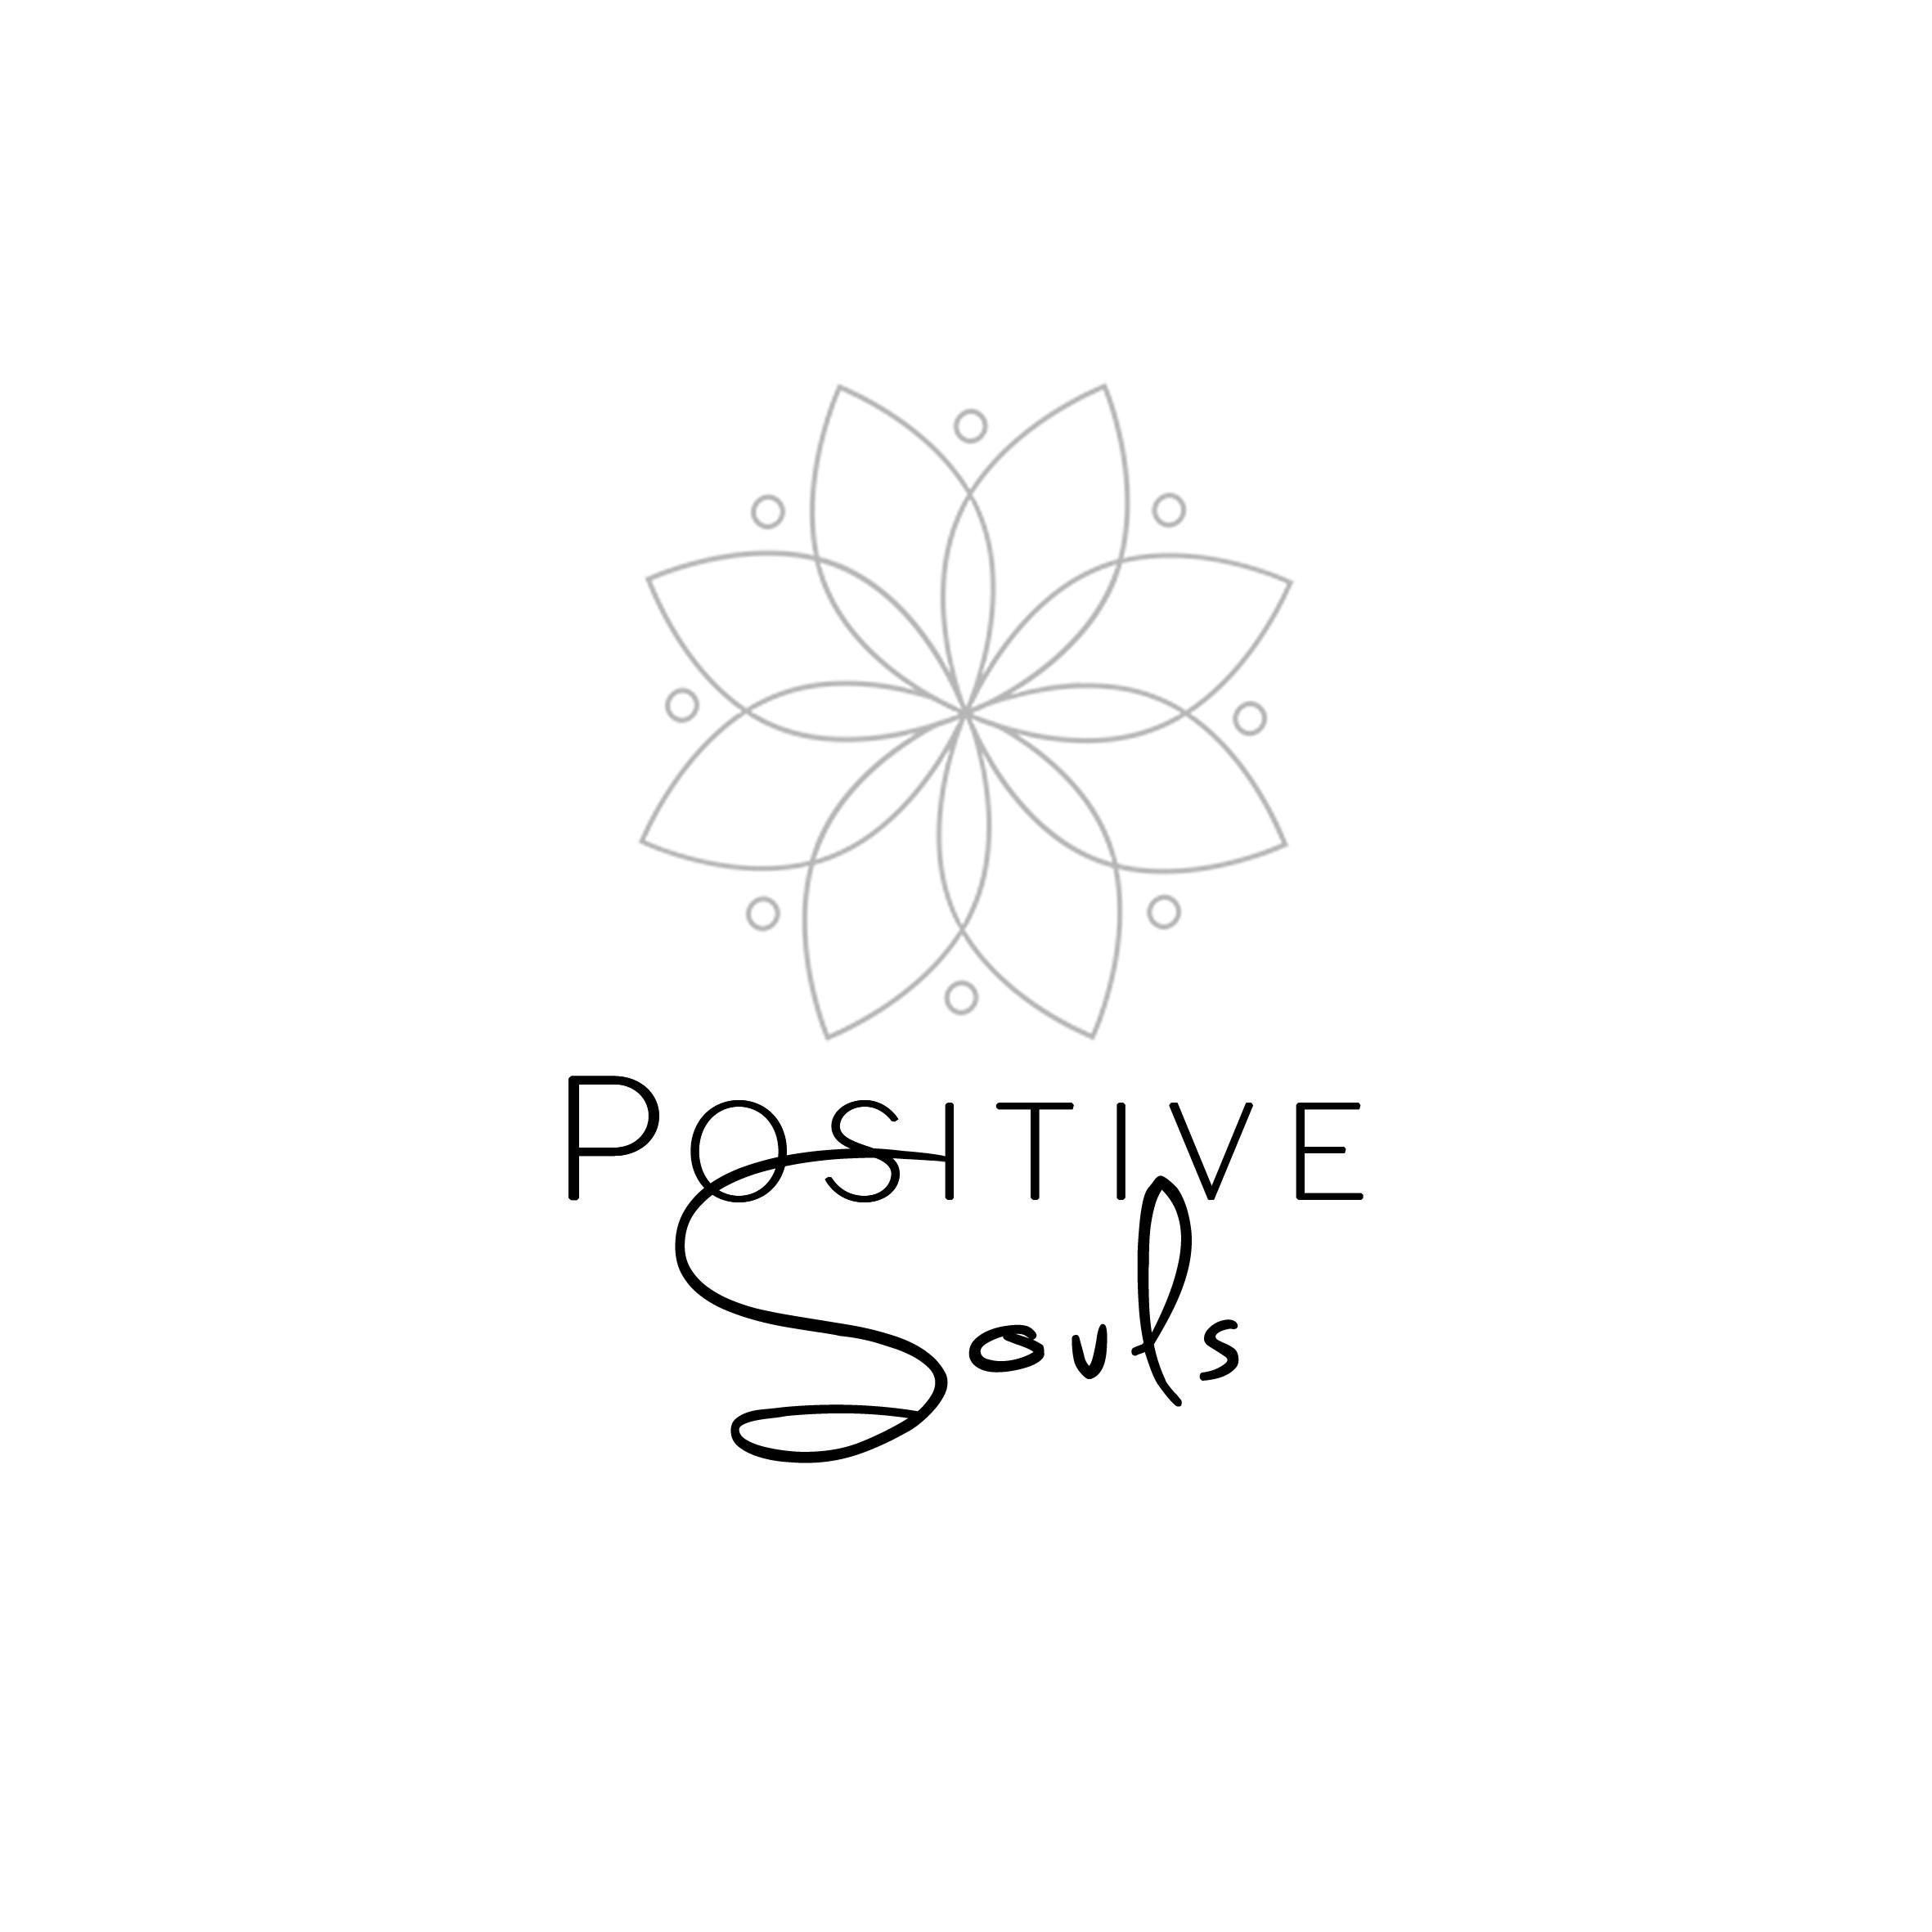 Positive Souls needs a inspirational logo